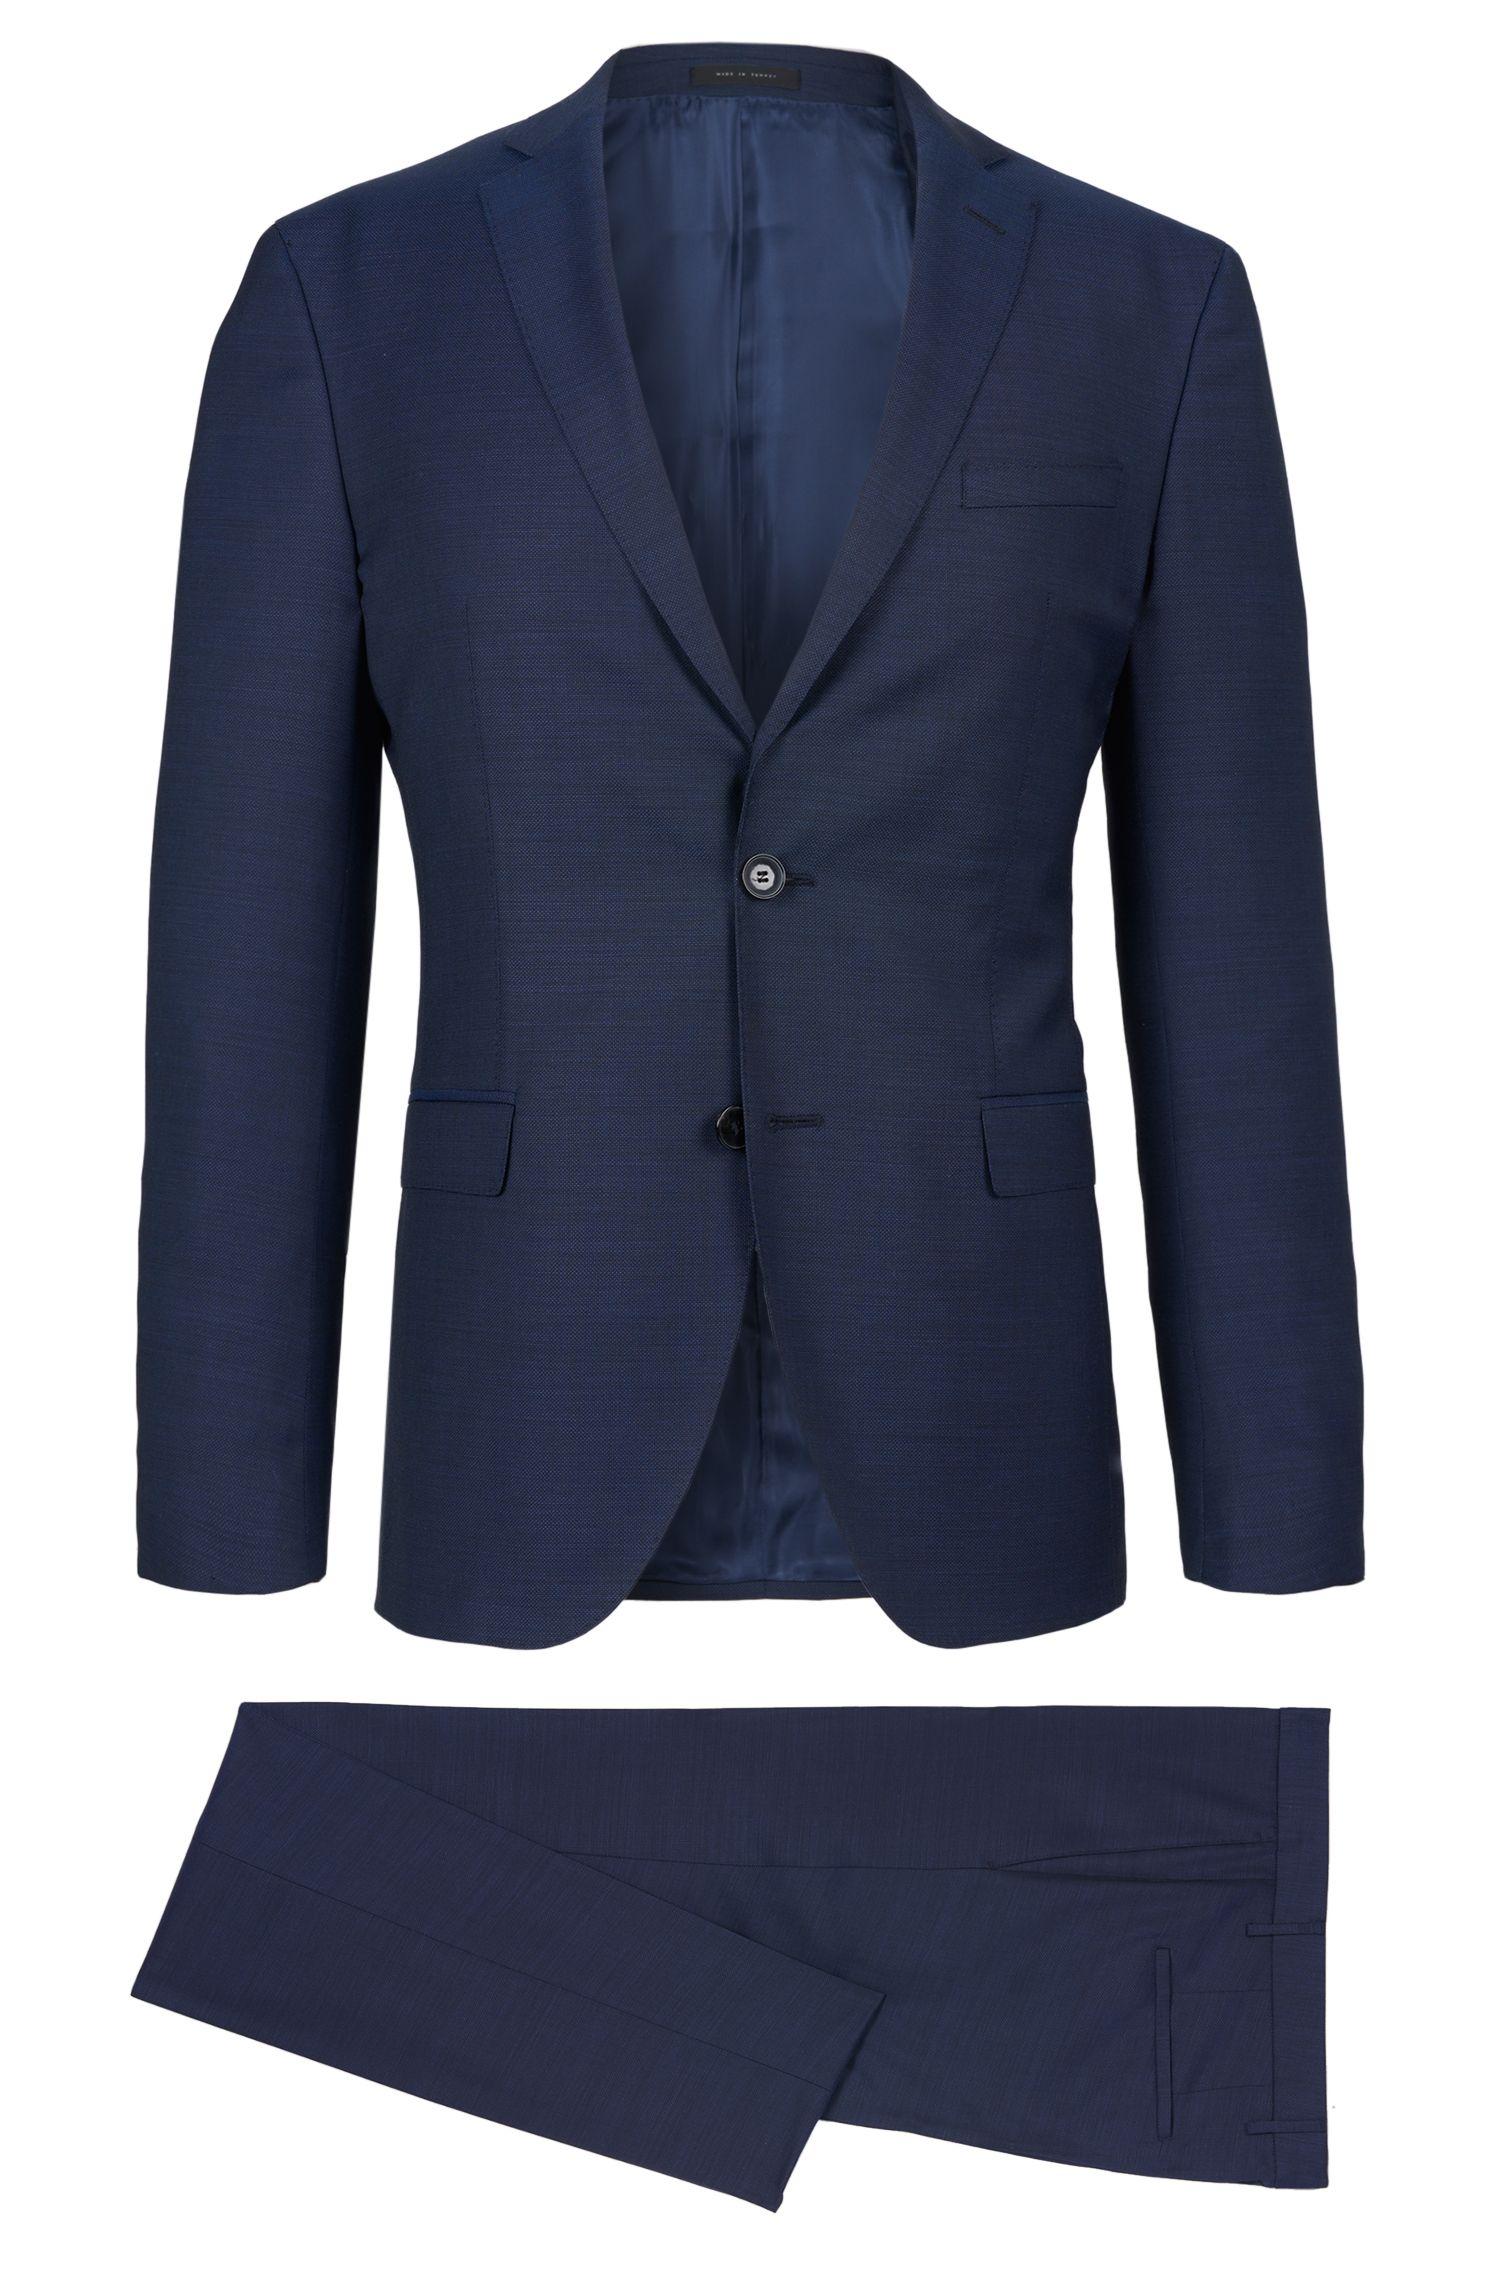 Birdseye Italian Super 100 Virgin Wool Suit, Extra-Slim Fit | Reyno/Wave